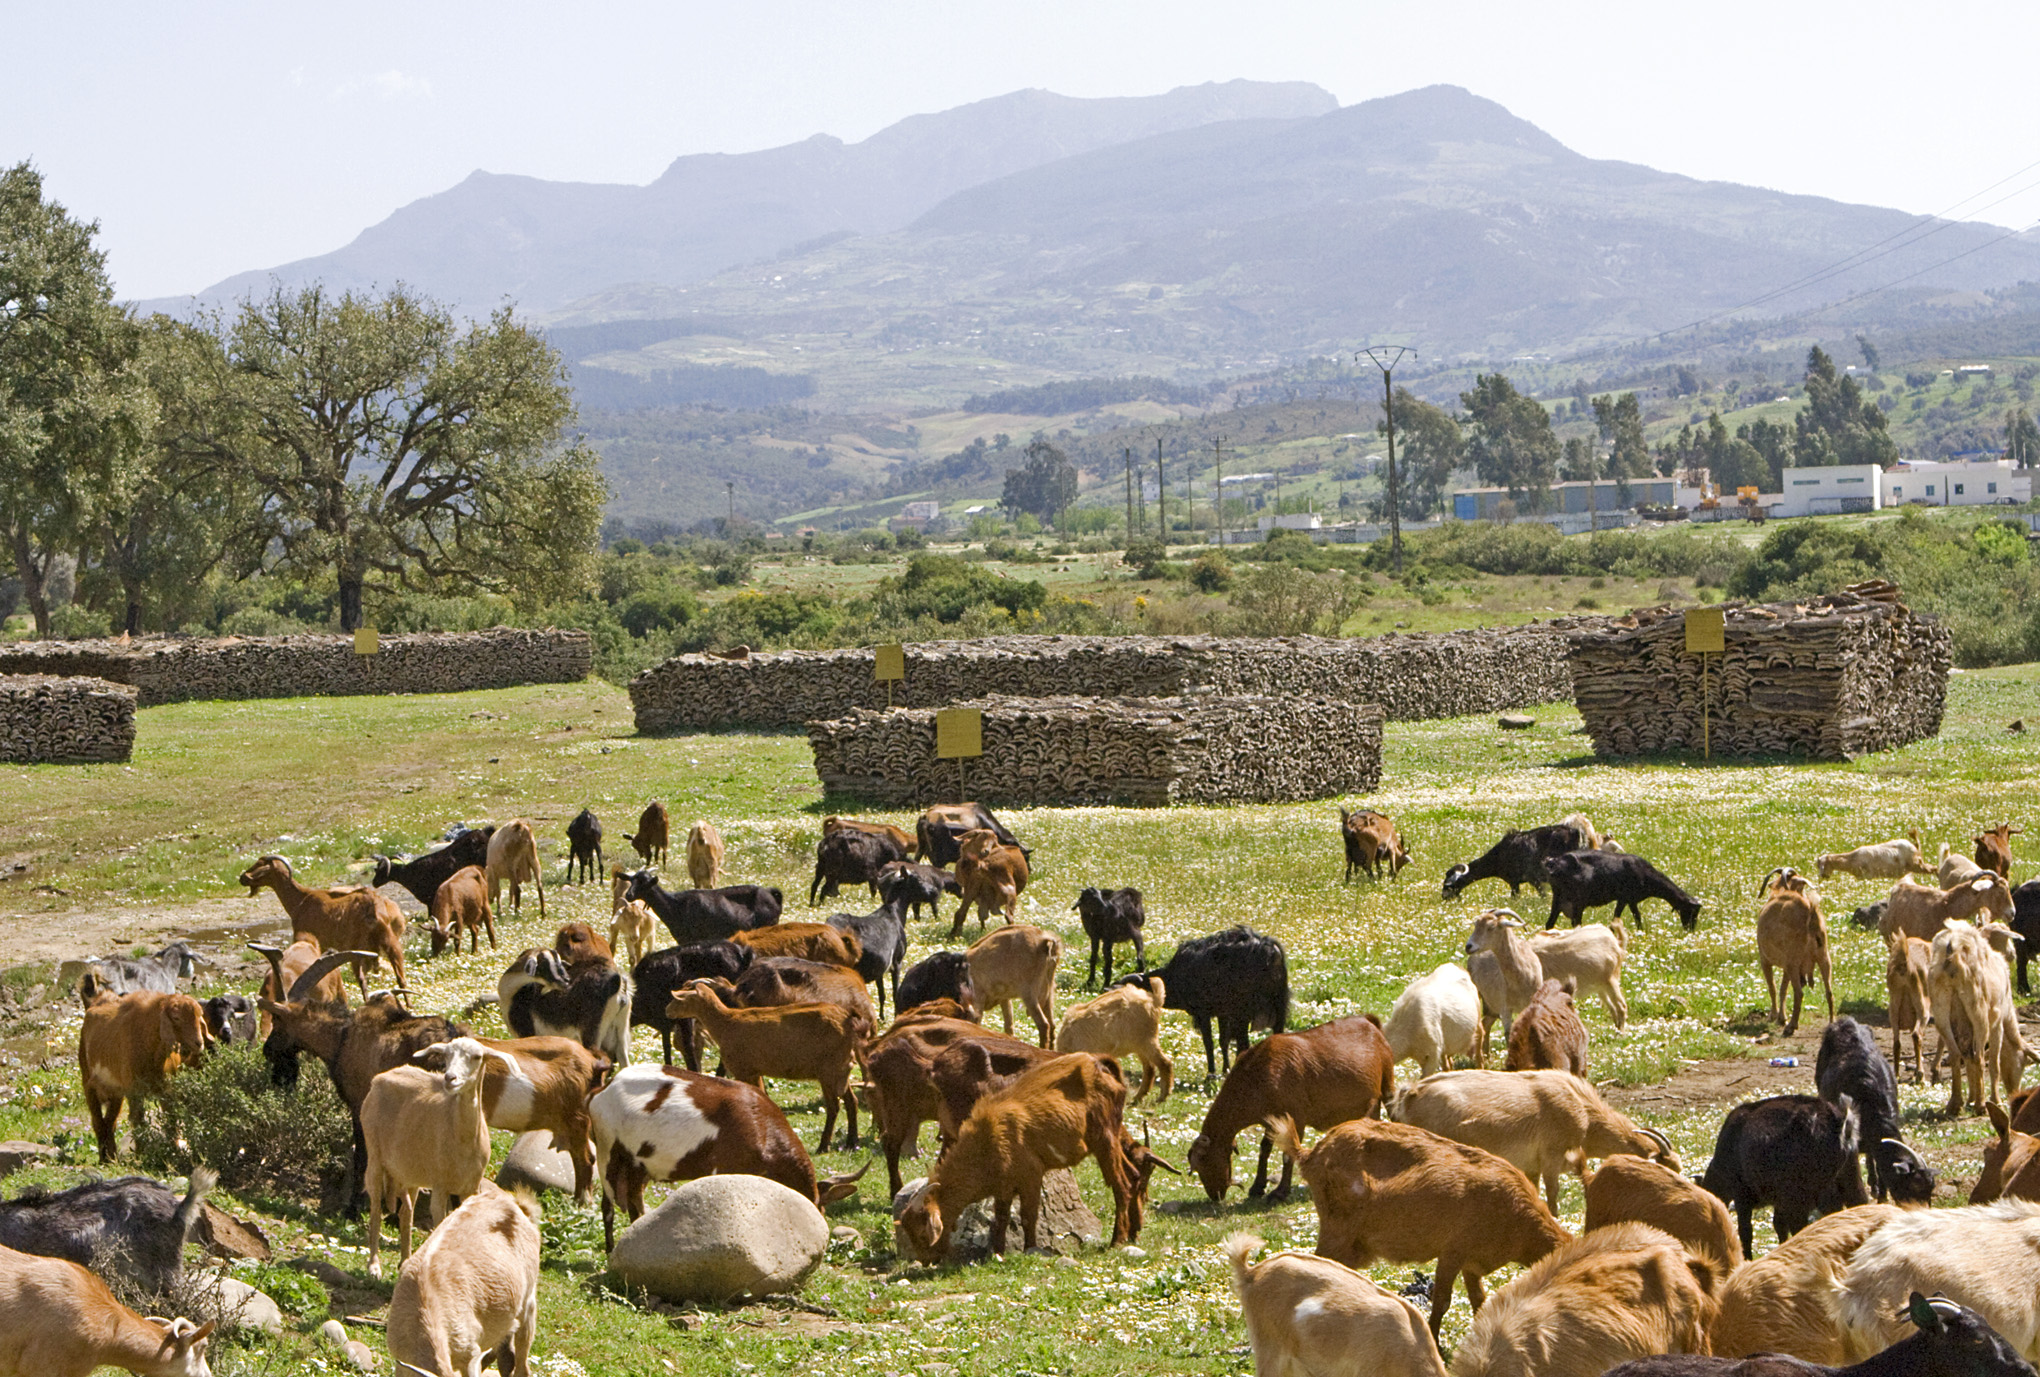 Farm Animal Portraits: Goats - 2